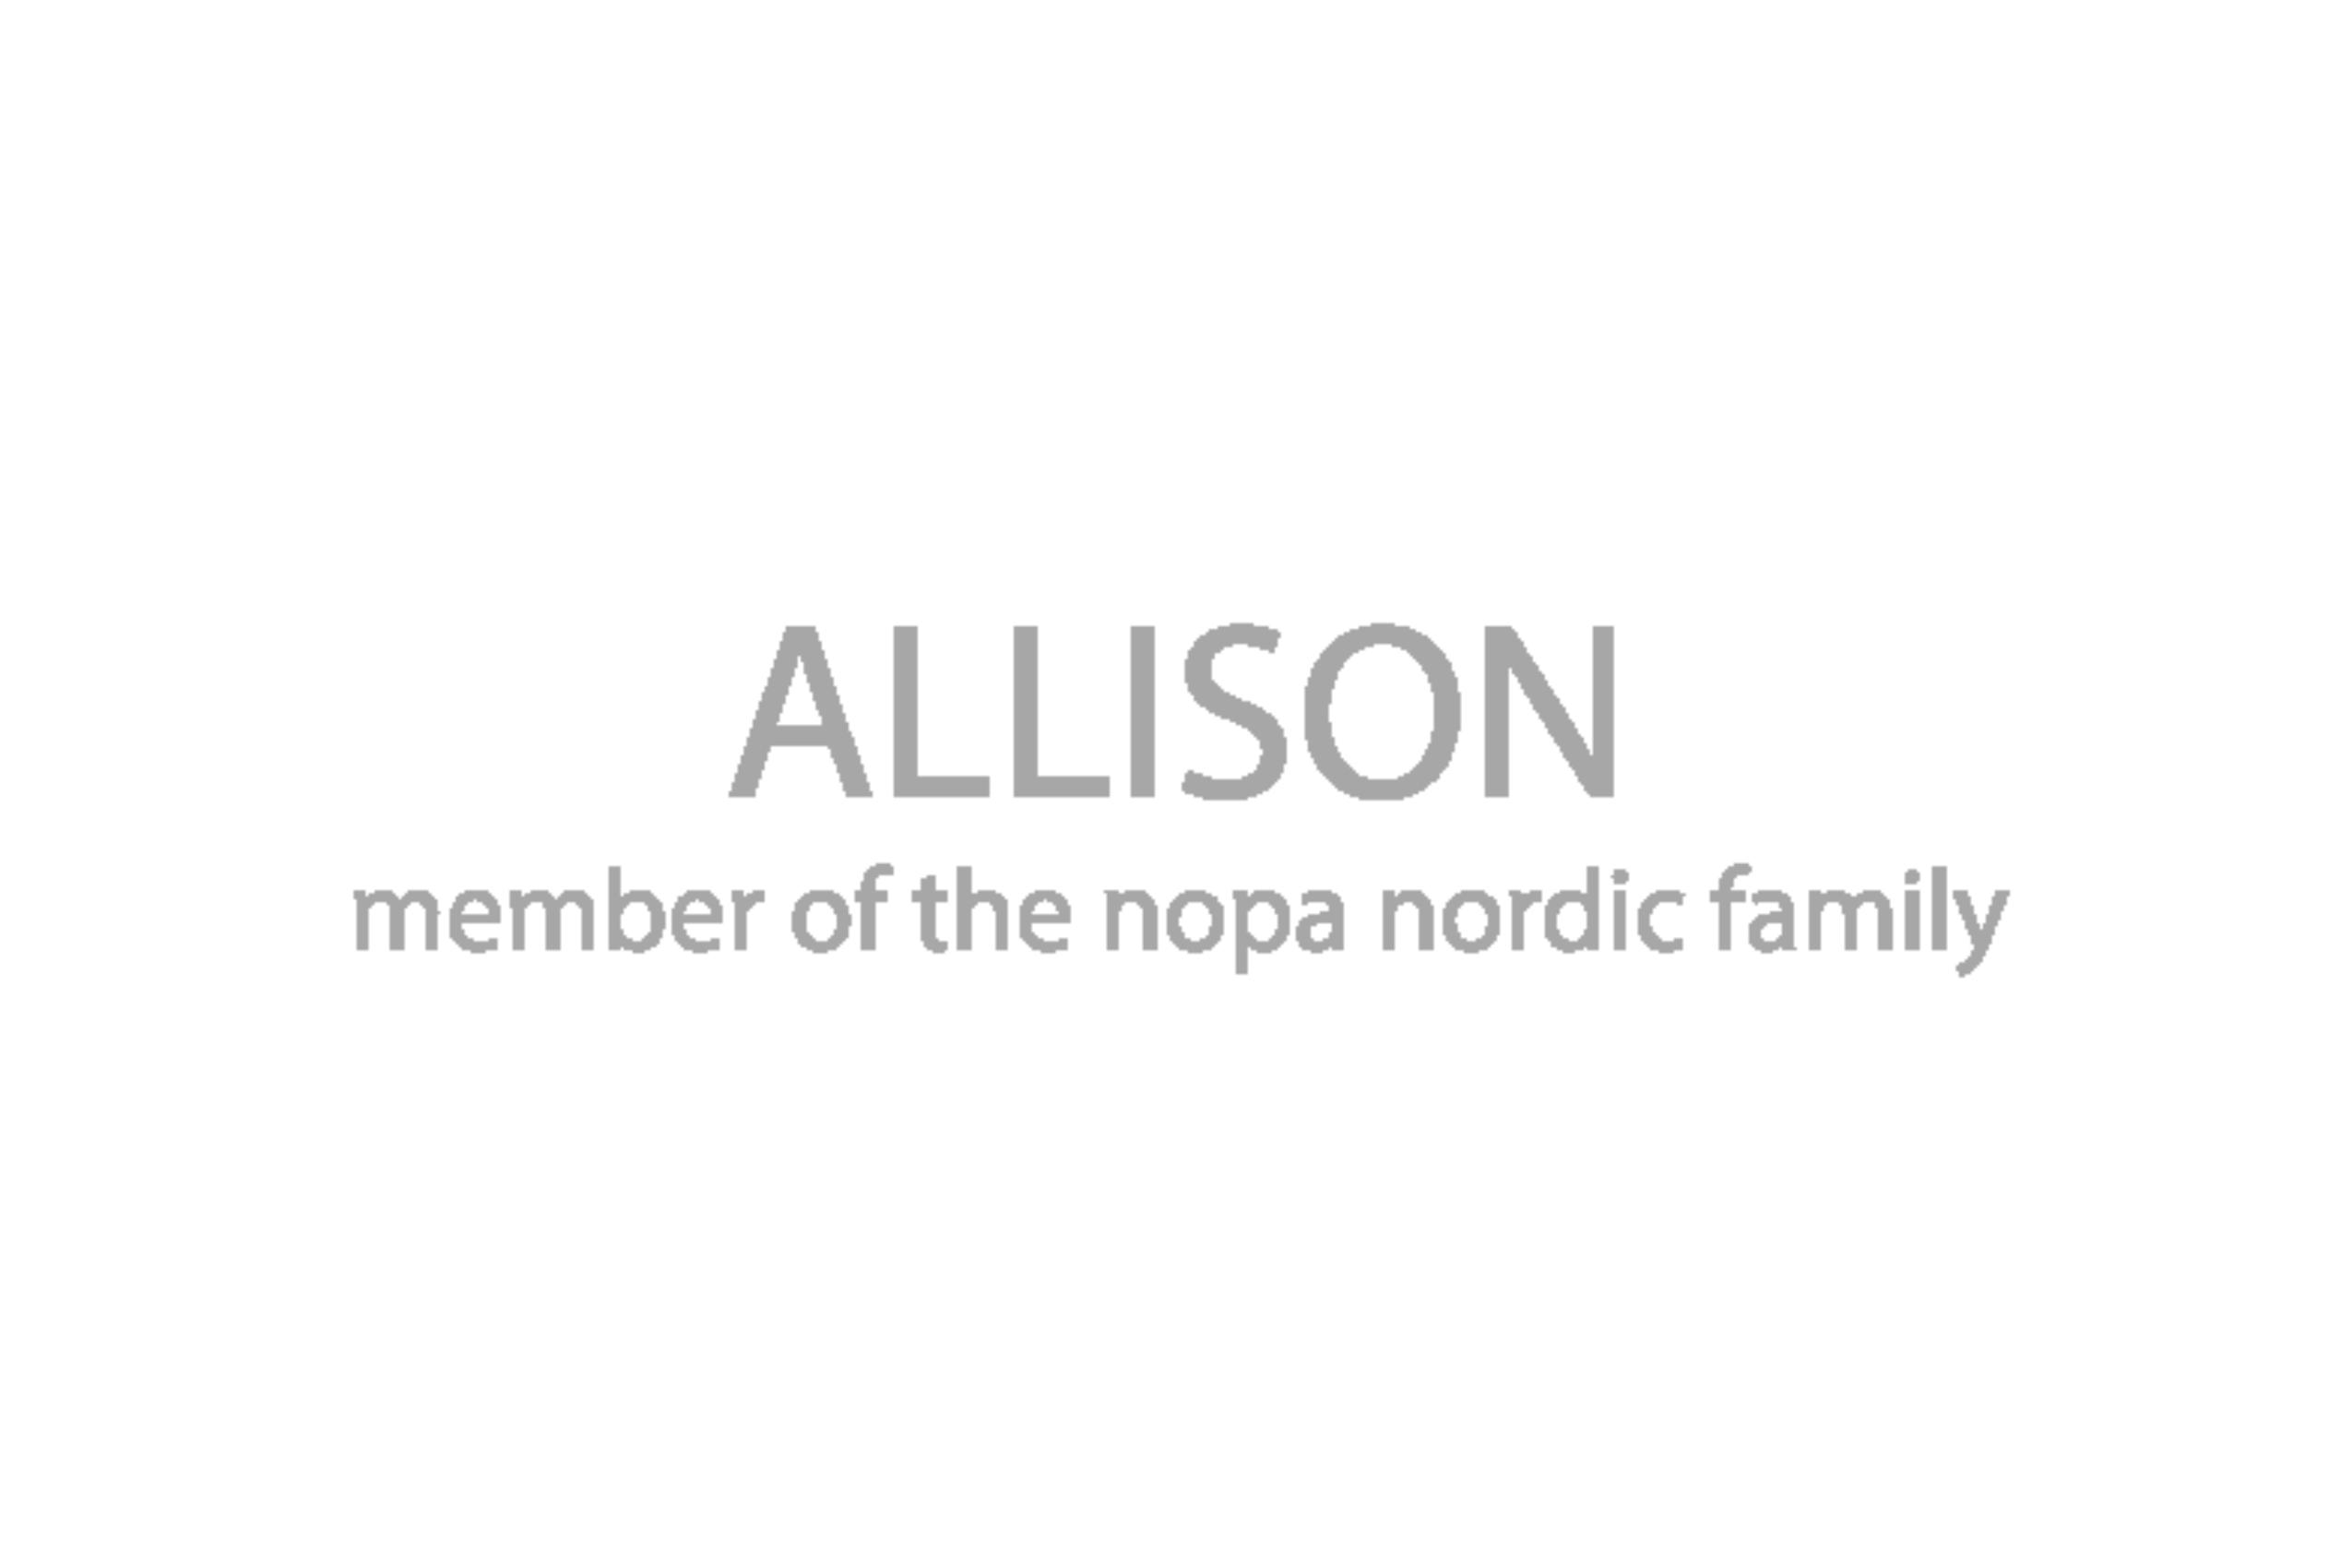 https://europeanplasticspact.org/wp-content/uploads/2021/05/allison-2.png